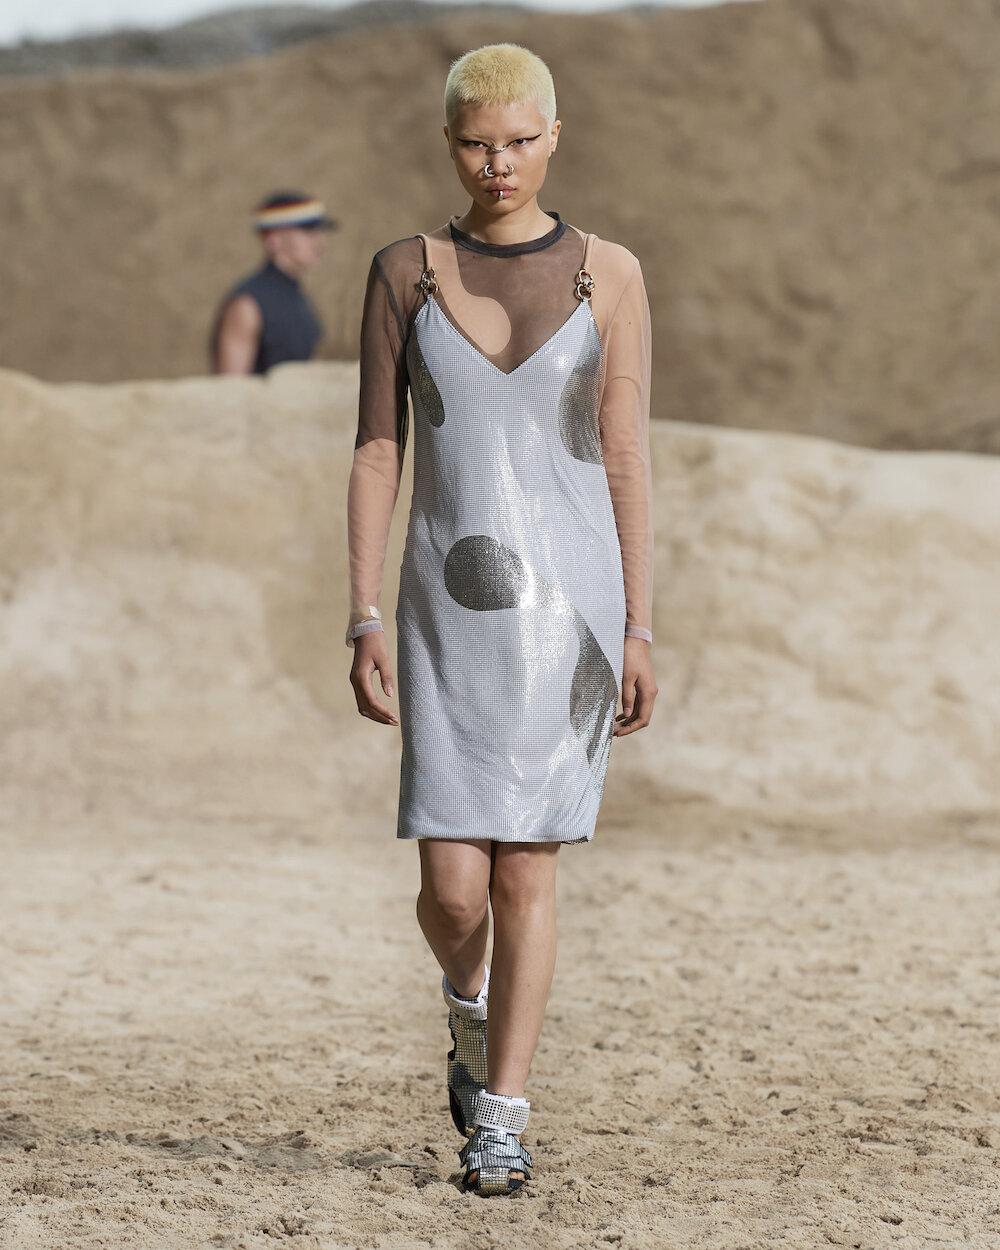 Burberry Spring_Summer 2022 Menswear Presentation Collection - Look 26 - Kayako.jpg